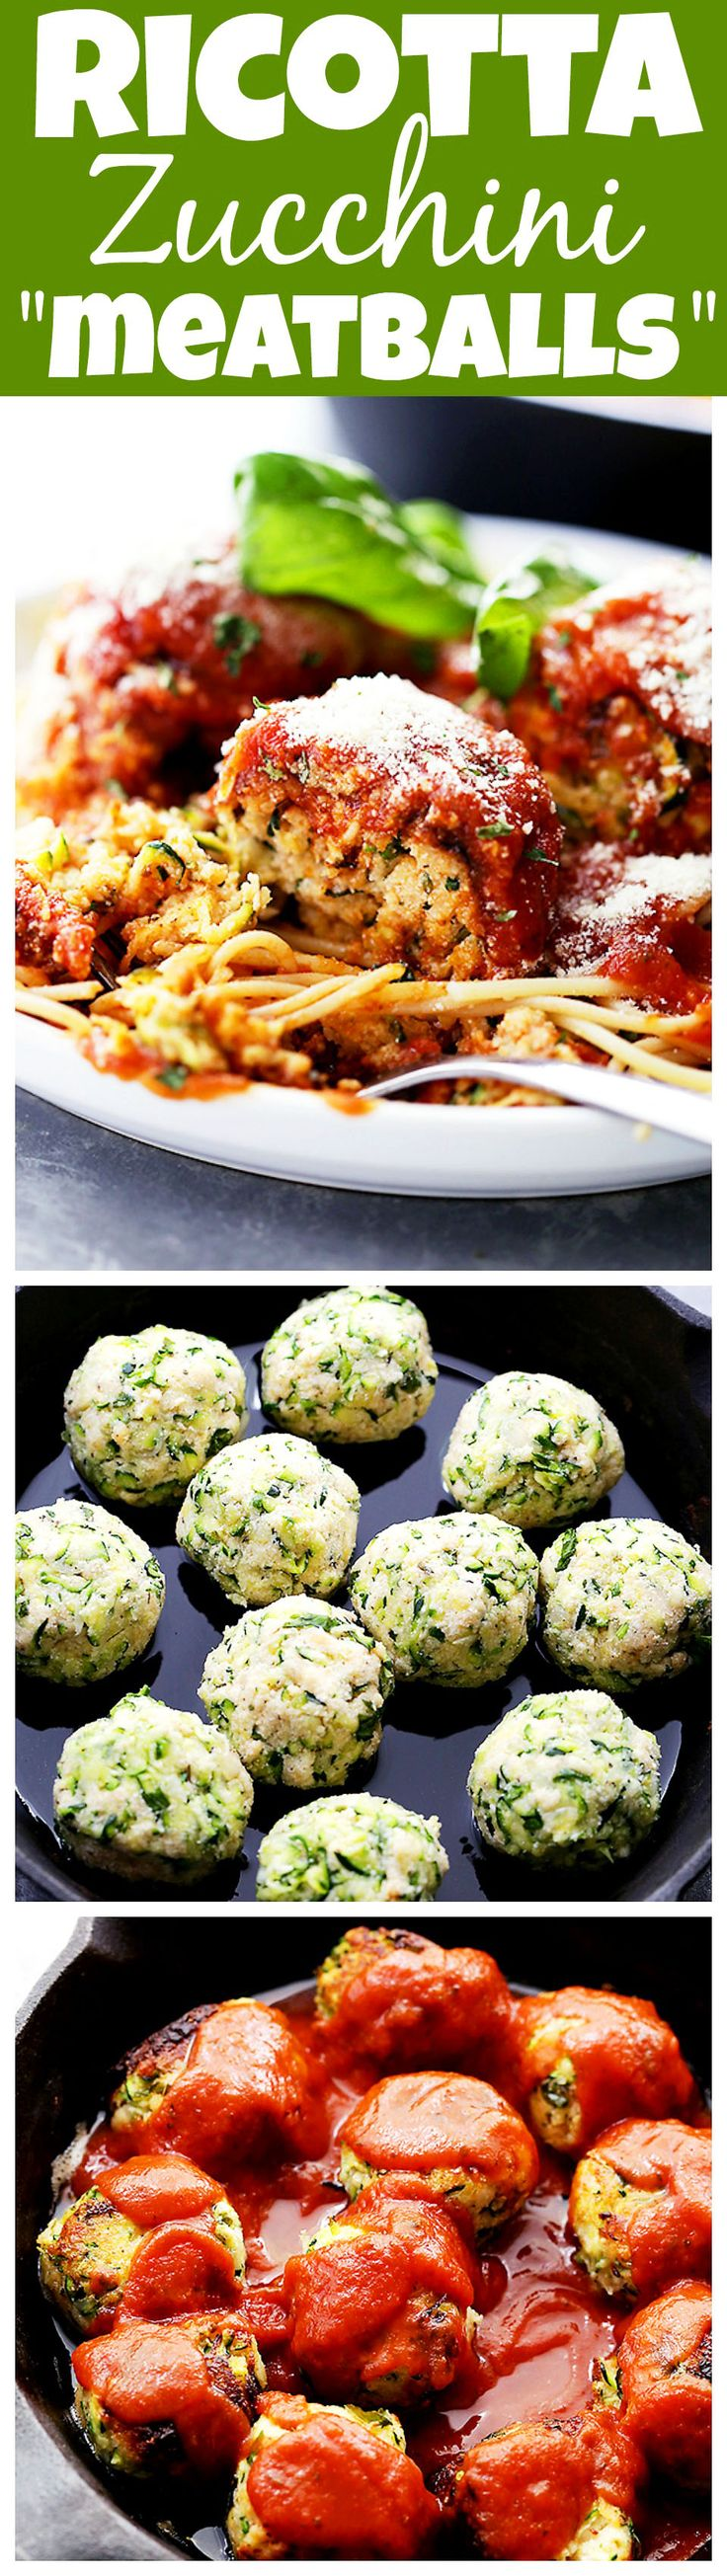 "Ricotta Zucchini ""Meatballs"" – Delicious, melt-in-your-mouth-amazing zucchini…"